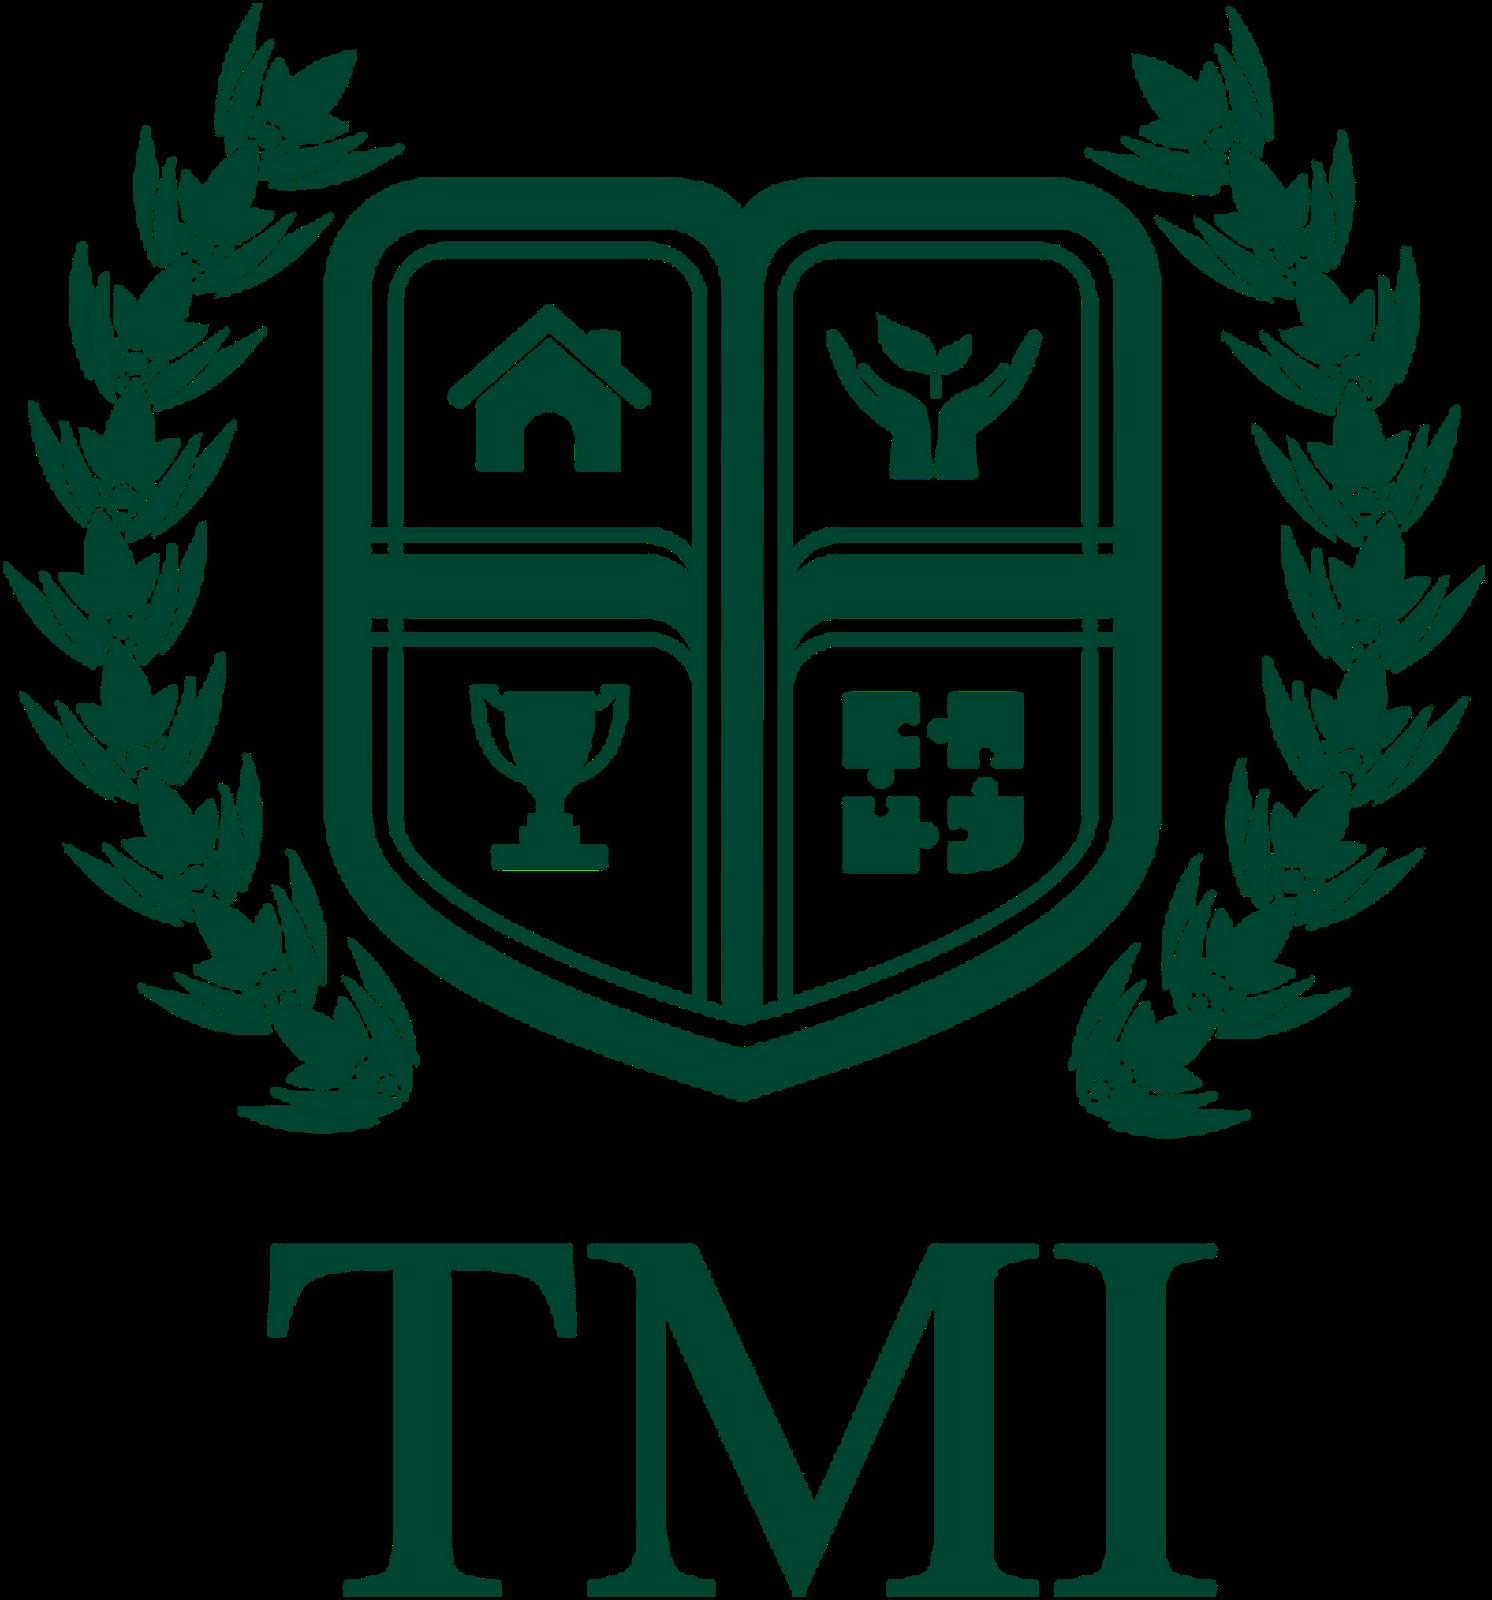 TMI_vertical-green%2B1600px Format Job Description Perusahaan on arimo produksi ai, unsur bentuk, besar di surabaya, besar di indonesia, akta pendirian, gambar struktur organisasi, gambar perum, gambar animasi gedung, contoh logo, contoh skdp,